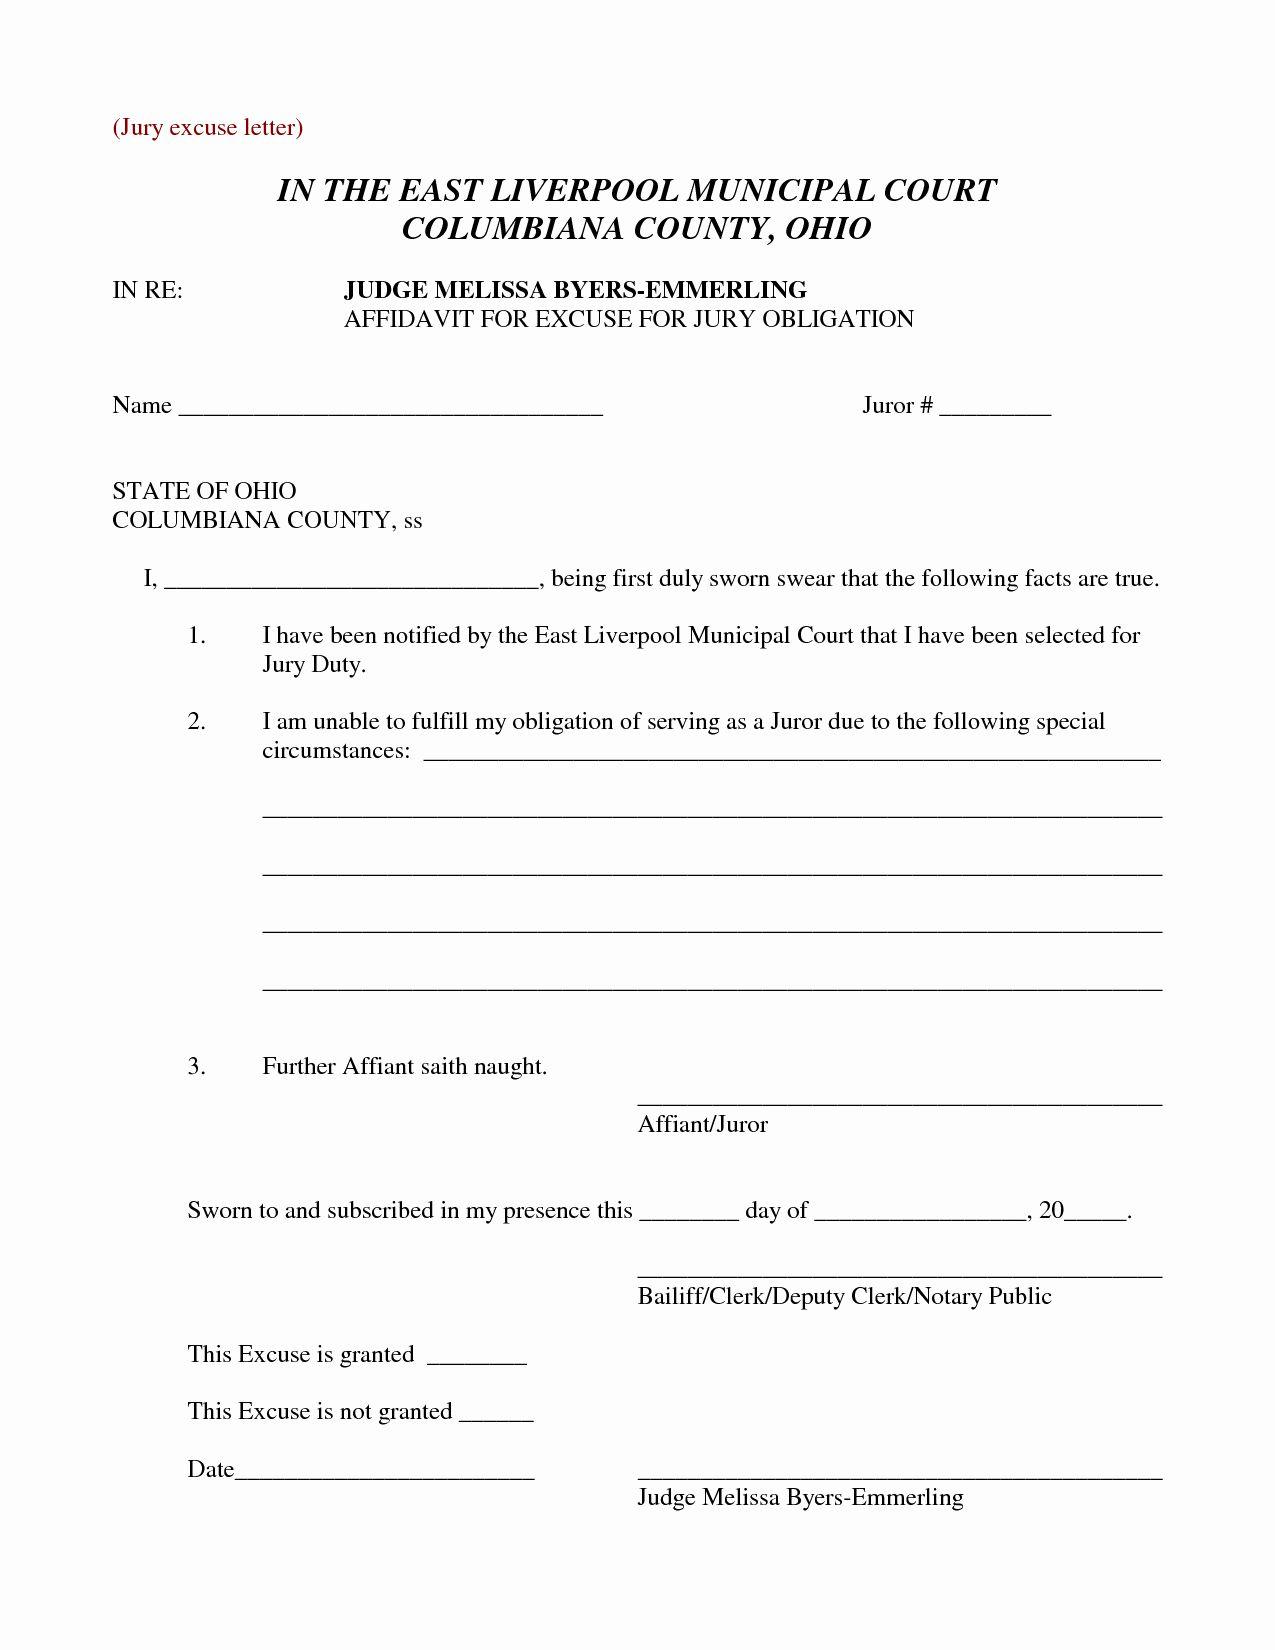 20 Jury Duty Work Excuse Letter Dannybarrantes Template In 2021 Letter Template Word Cover Letter Template Doctors Note Jury duty excuse letter template